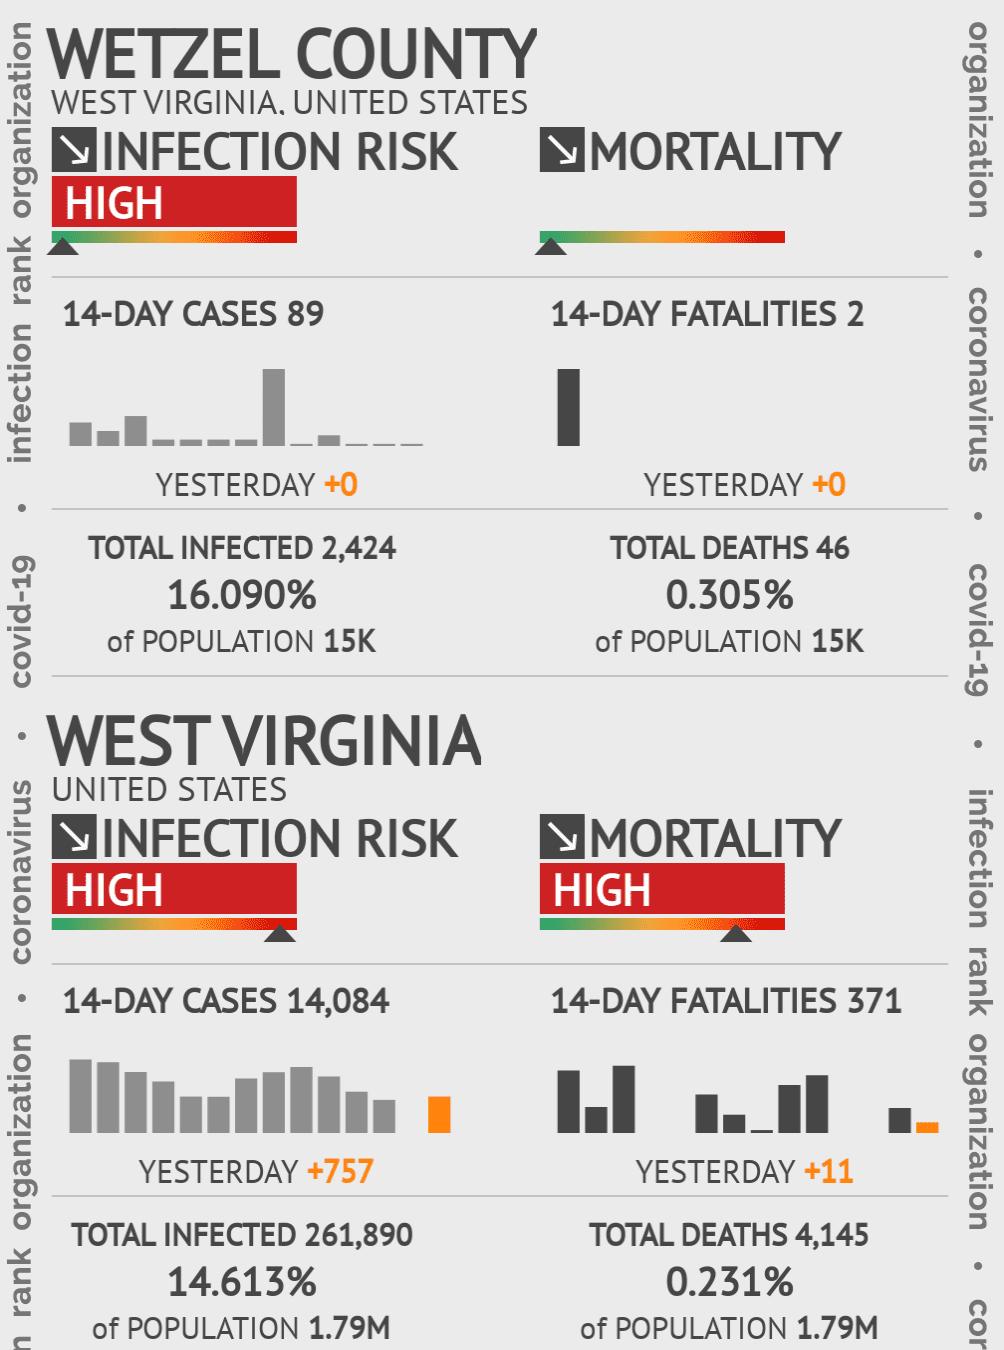 Wetzel County Coronavirus Covid-19 Risk of Infection on July 24, 2021